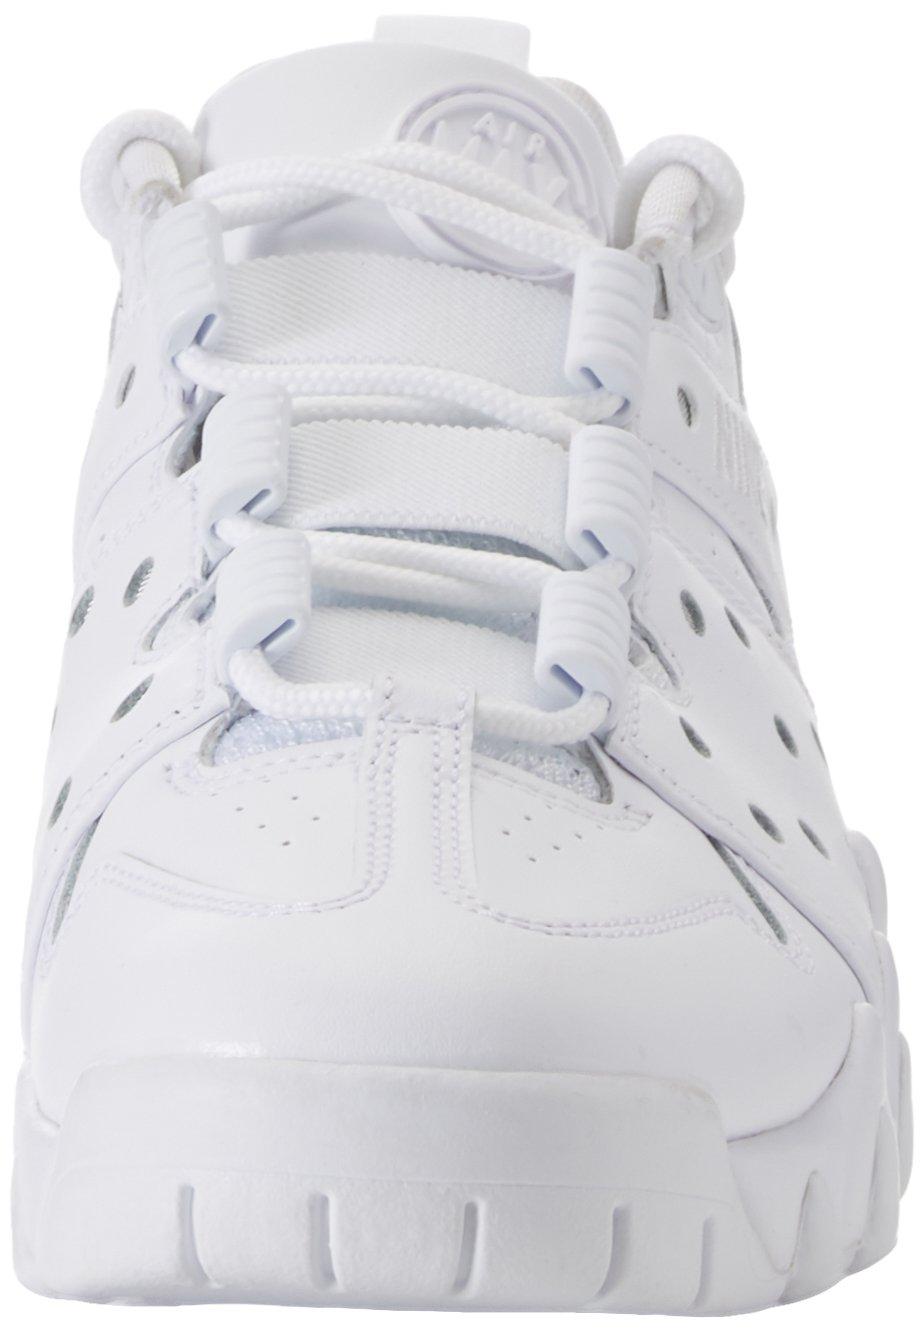 Nike Air 13486 Max2 Nike CB 94 13486 Air Low Zapatos de Para Baloncesto Para 5d2203